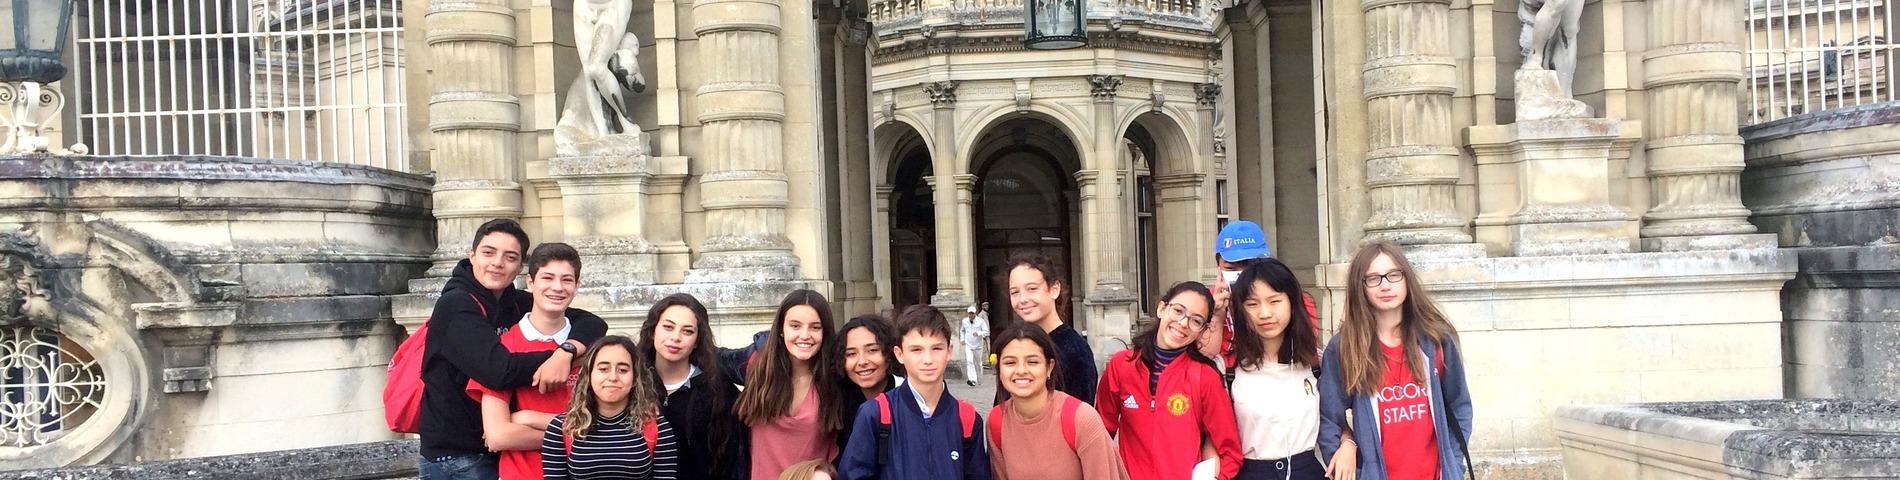 Accord French Language School resim 1